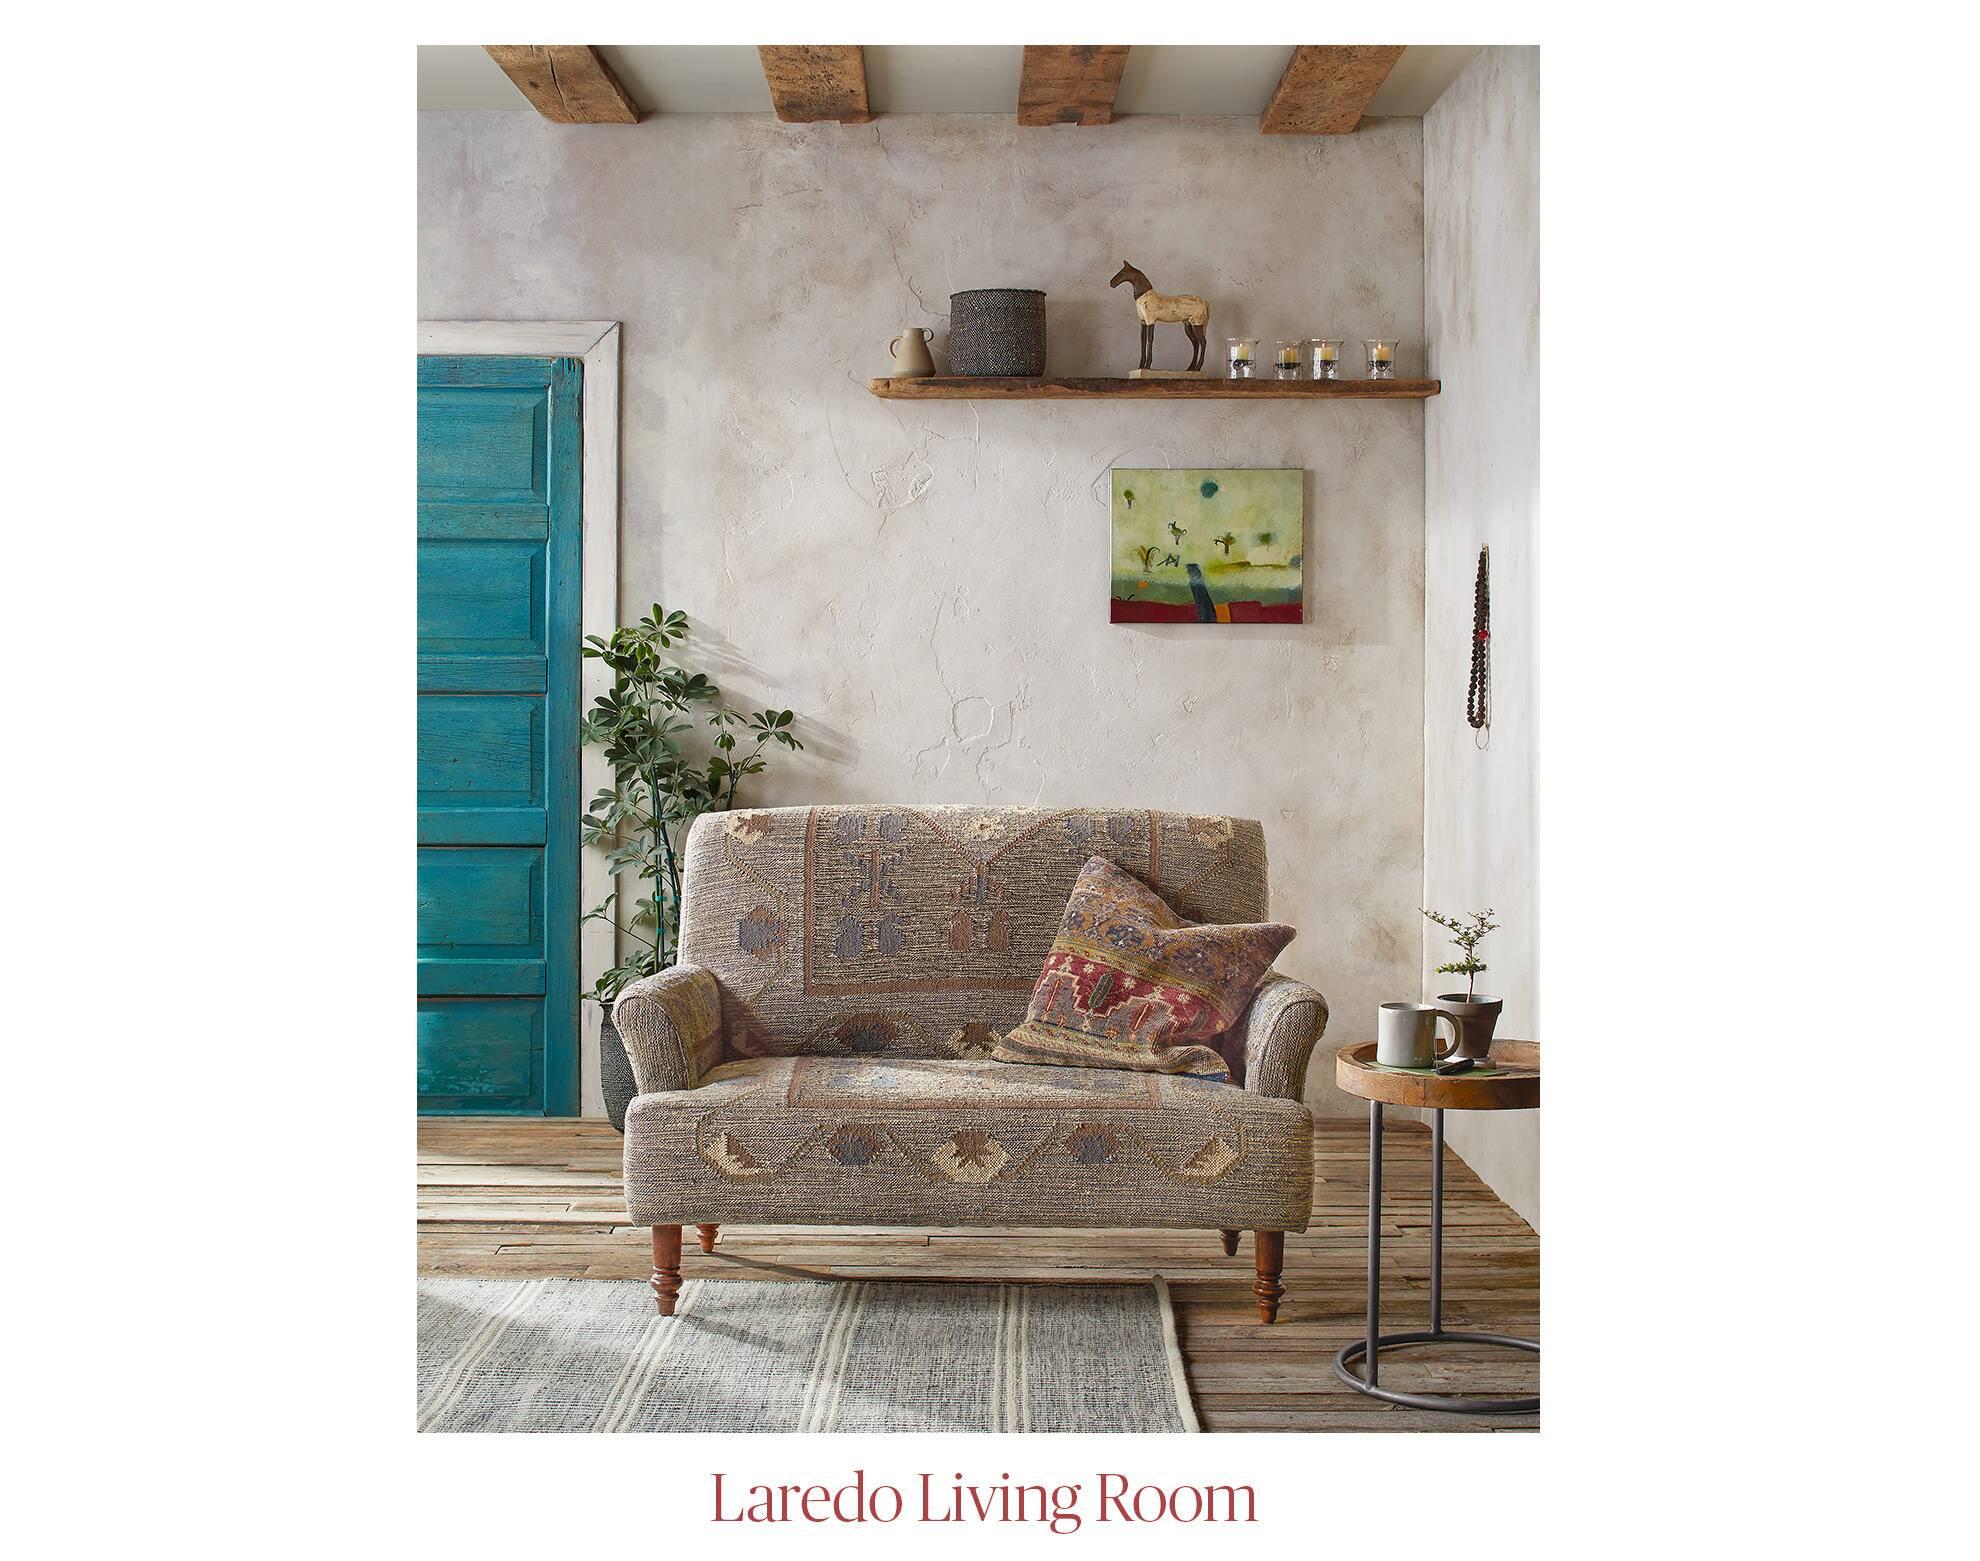 Laredo Living